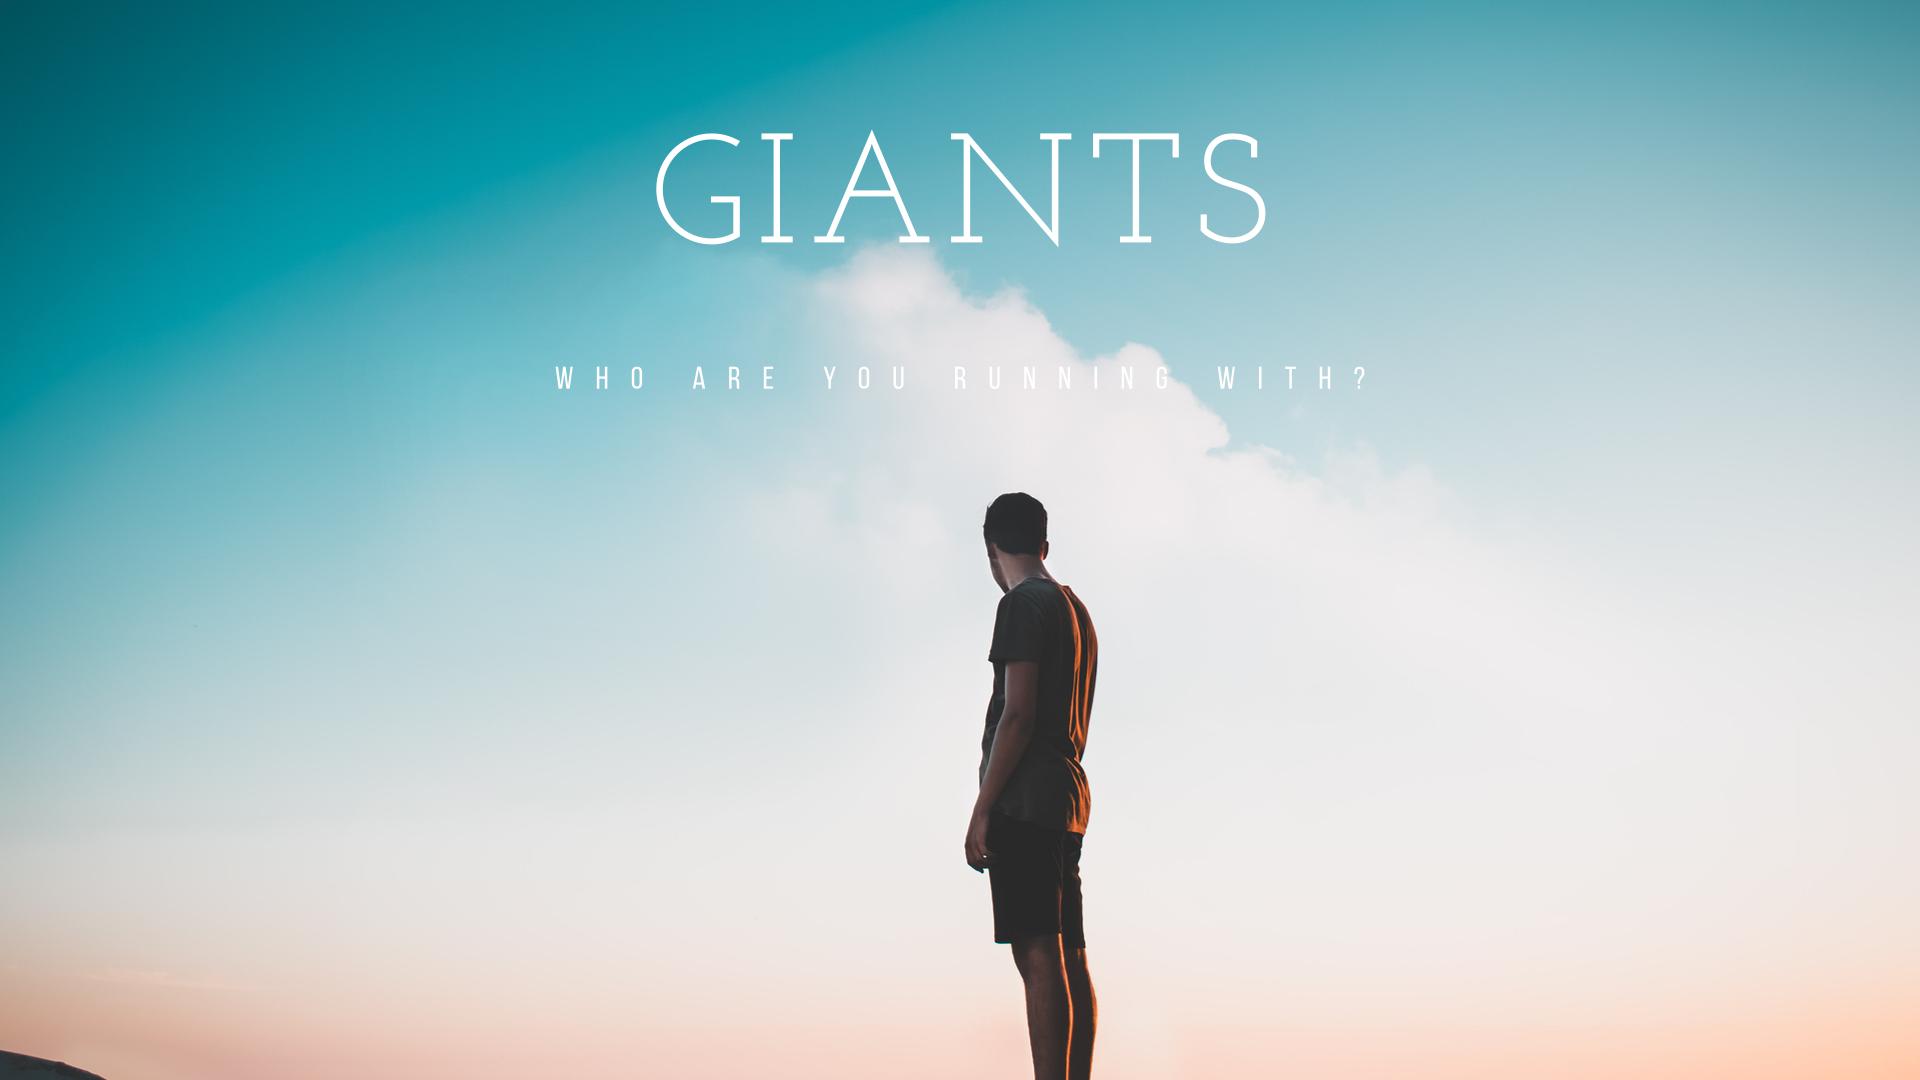 Giants_Sermon_Slide.png